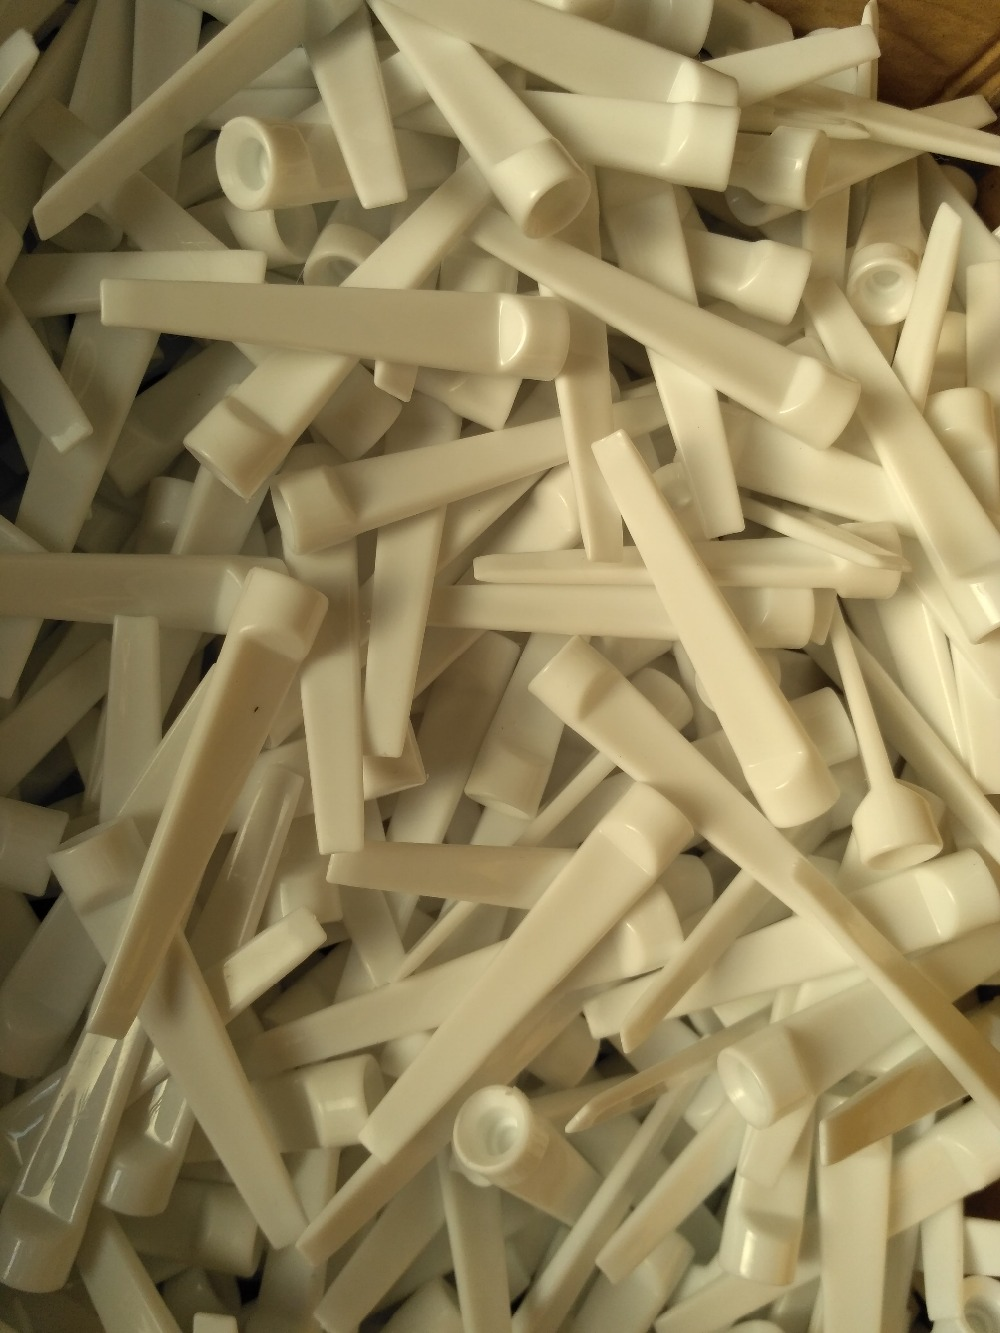 100pcs/ lot 70mm white plastic golf tee